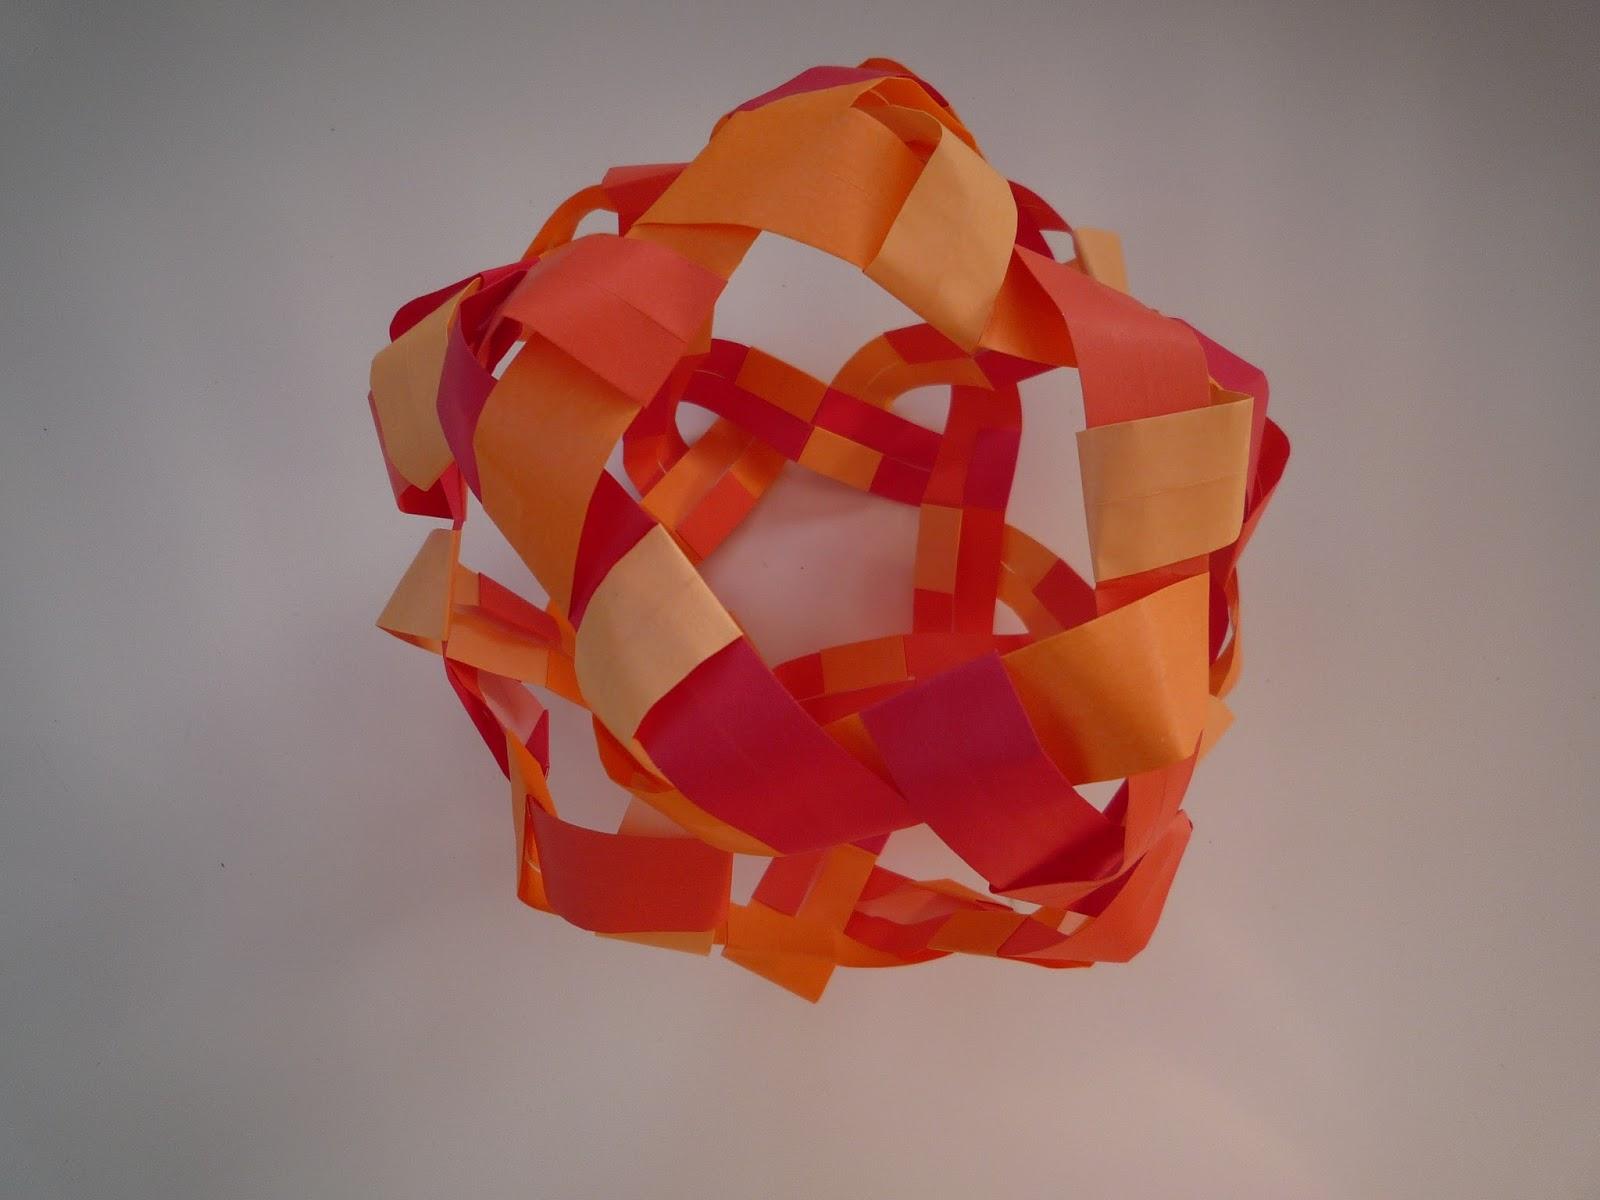 A new origami tutorial by Tadashi Mori - Kusudama Aline ... - photo#20